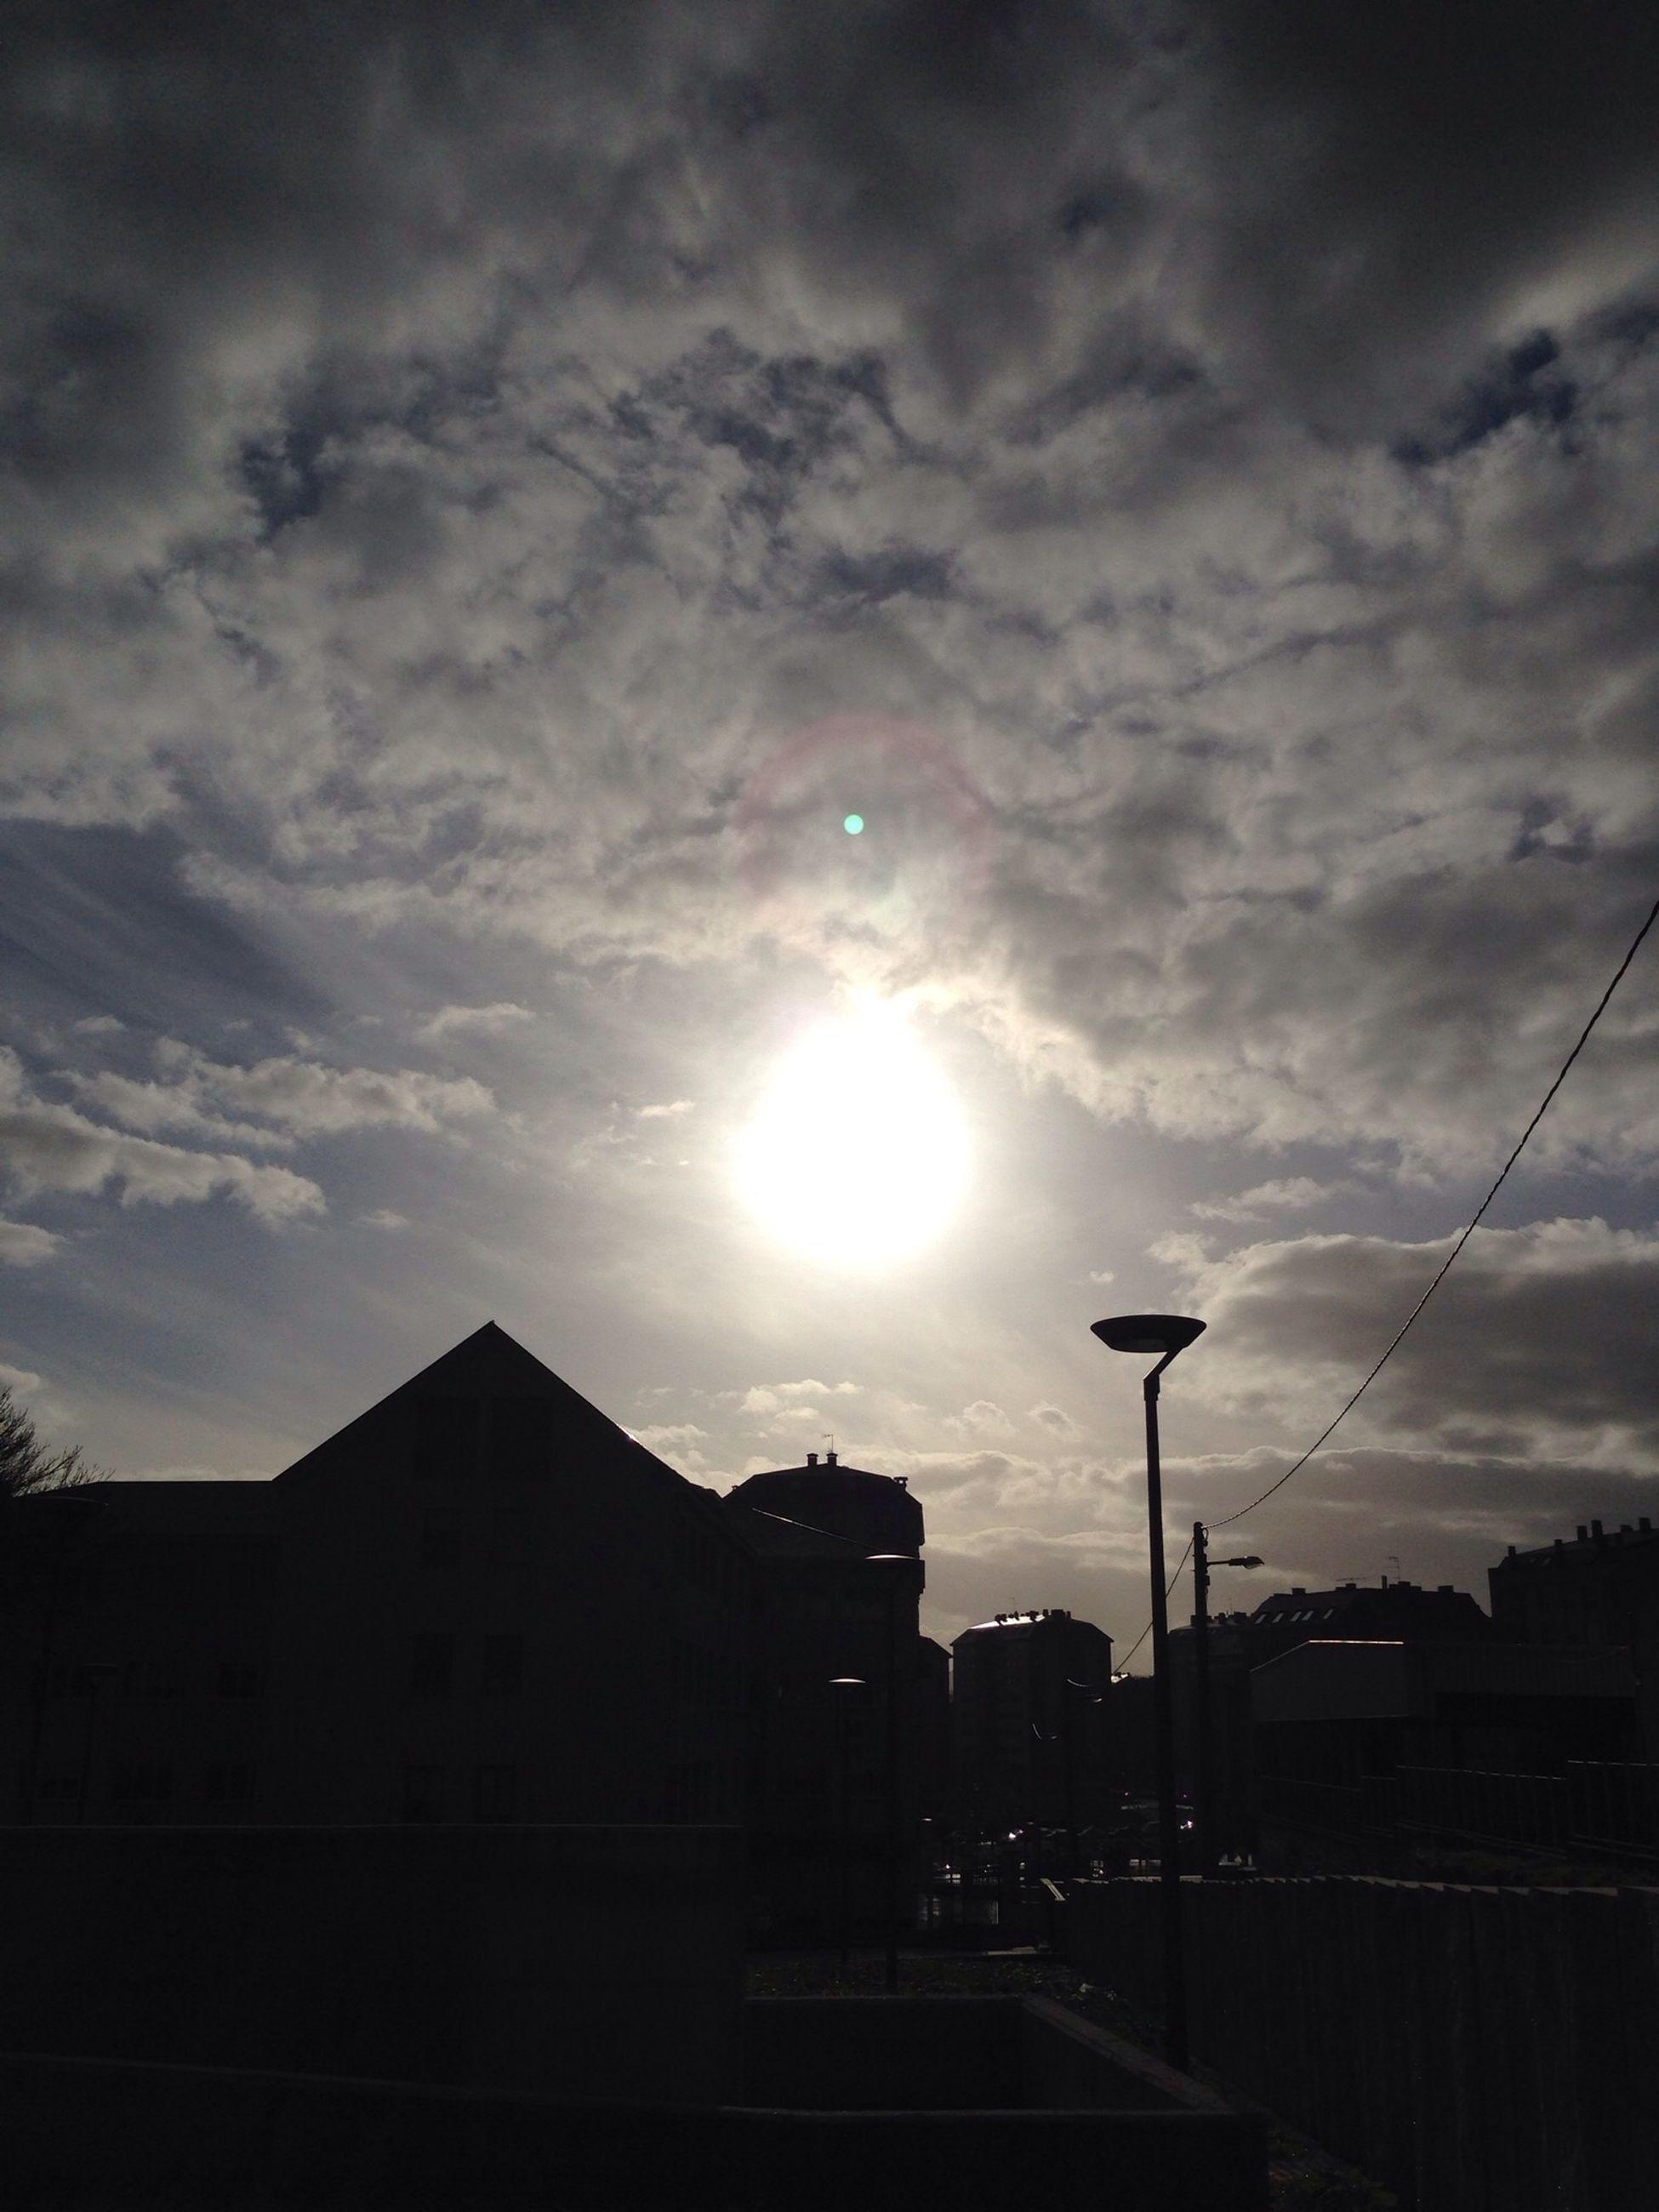 sky, building exterior, built structure, sun, architecture, cloud - sky, street light, silhouette, sunset, sunbeam, sunlight, cloudy, city, cloud, lens flare, low angle view, building, outdoors, street, no people